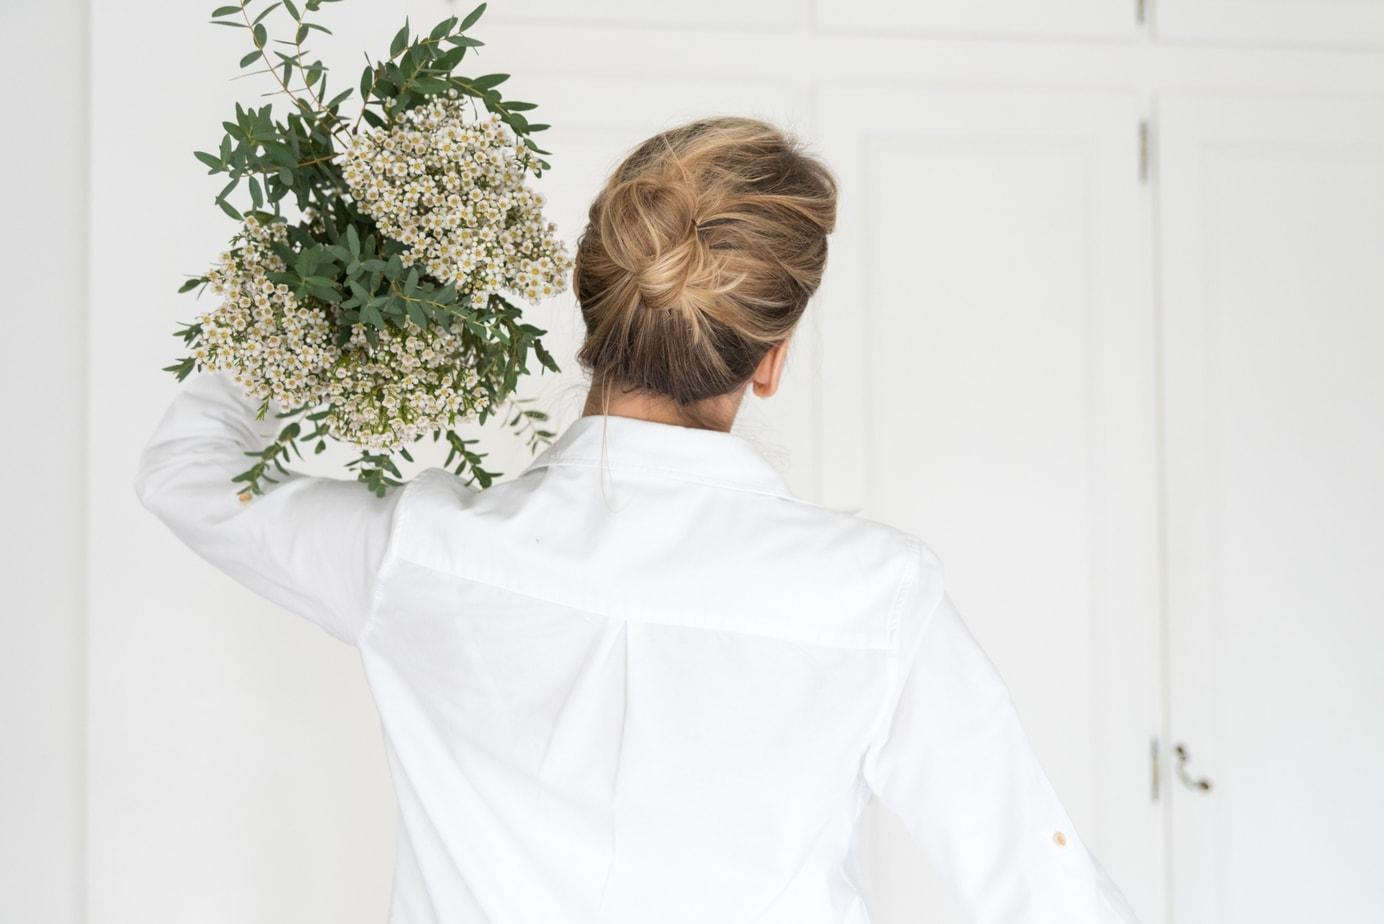 comment pr parer sa garde robe de printemps le dressing id al. Black Bedroom Furniture Sets. Home Design Ideas